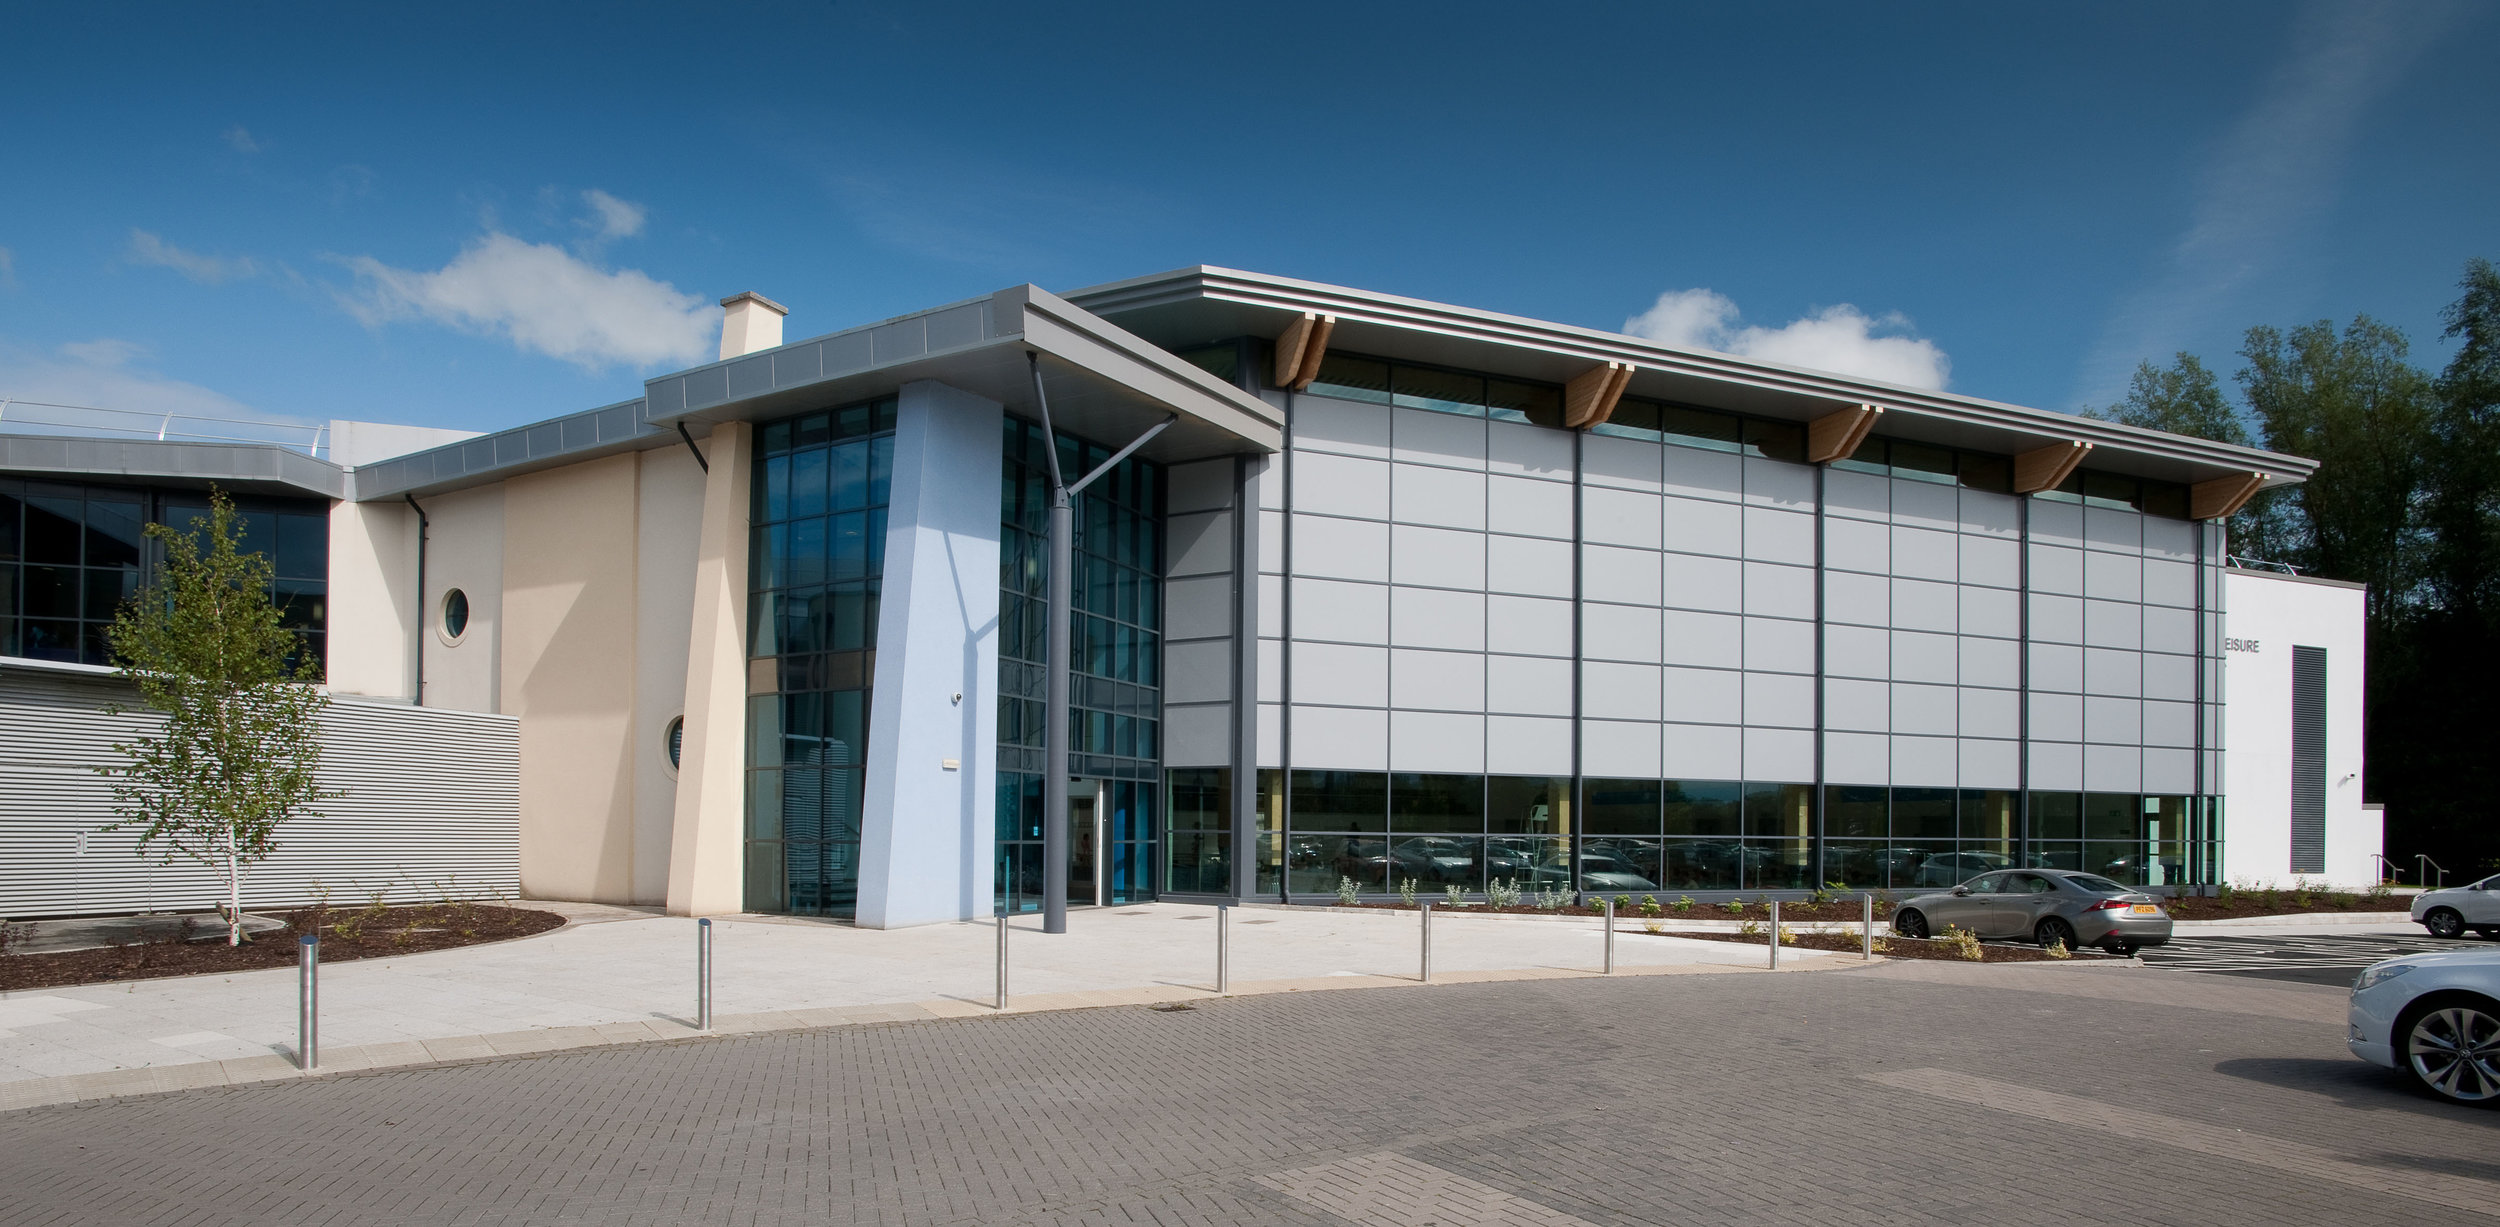 Omagh Leisure Complex 006.jpg